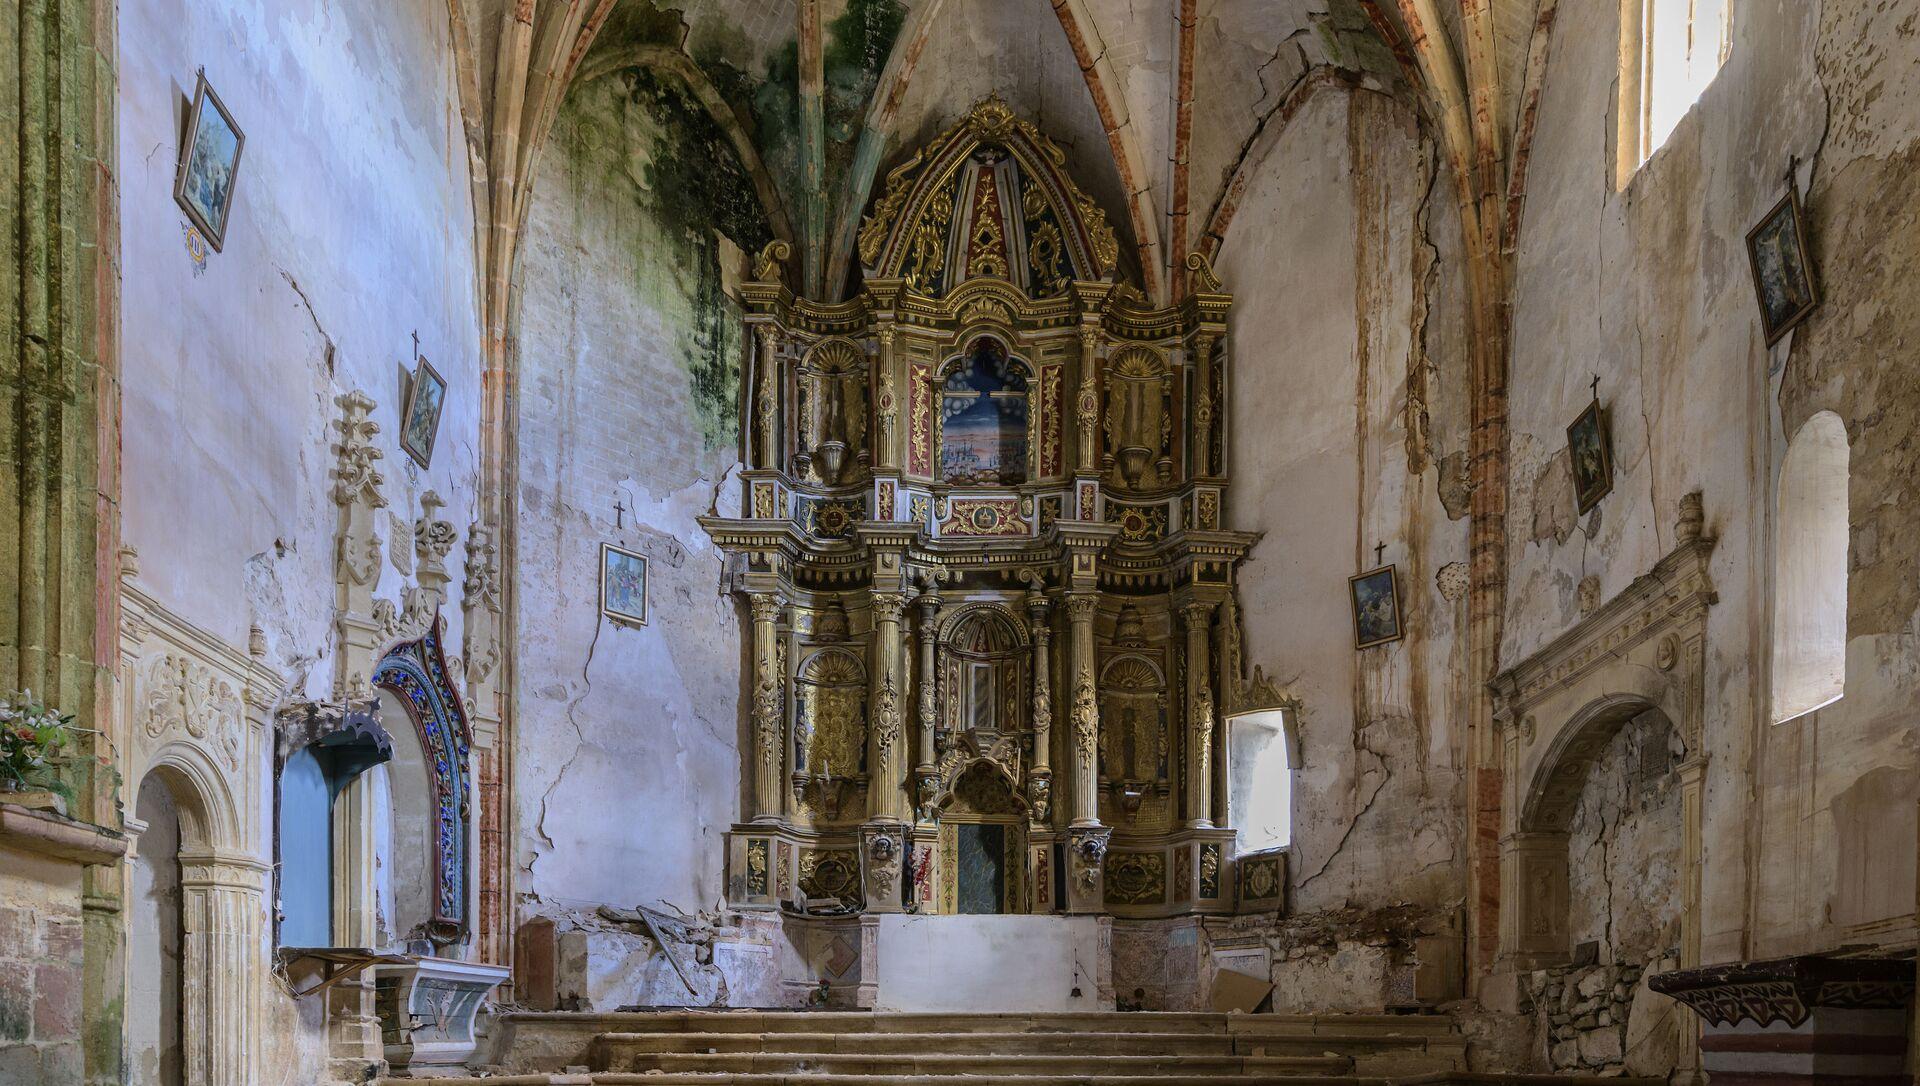 Iglesia de Fuenteodra en Burgos  - Sputnik Mundo, 1920, 20.11.2020